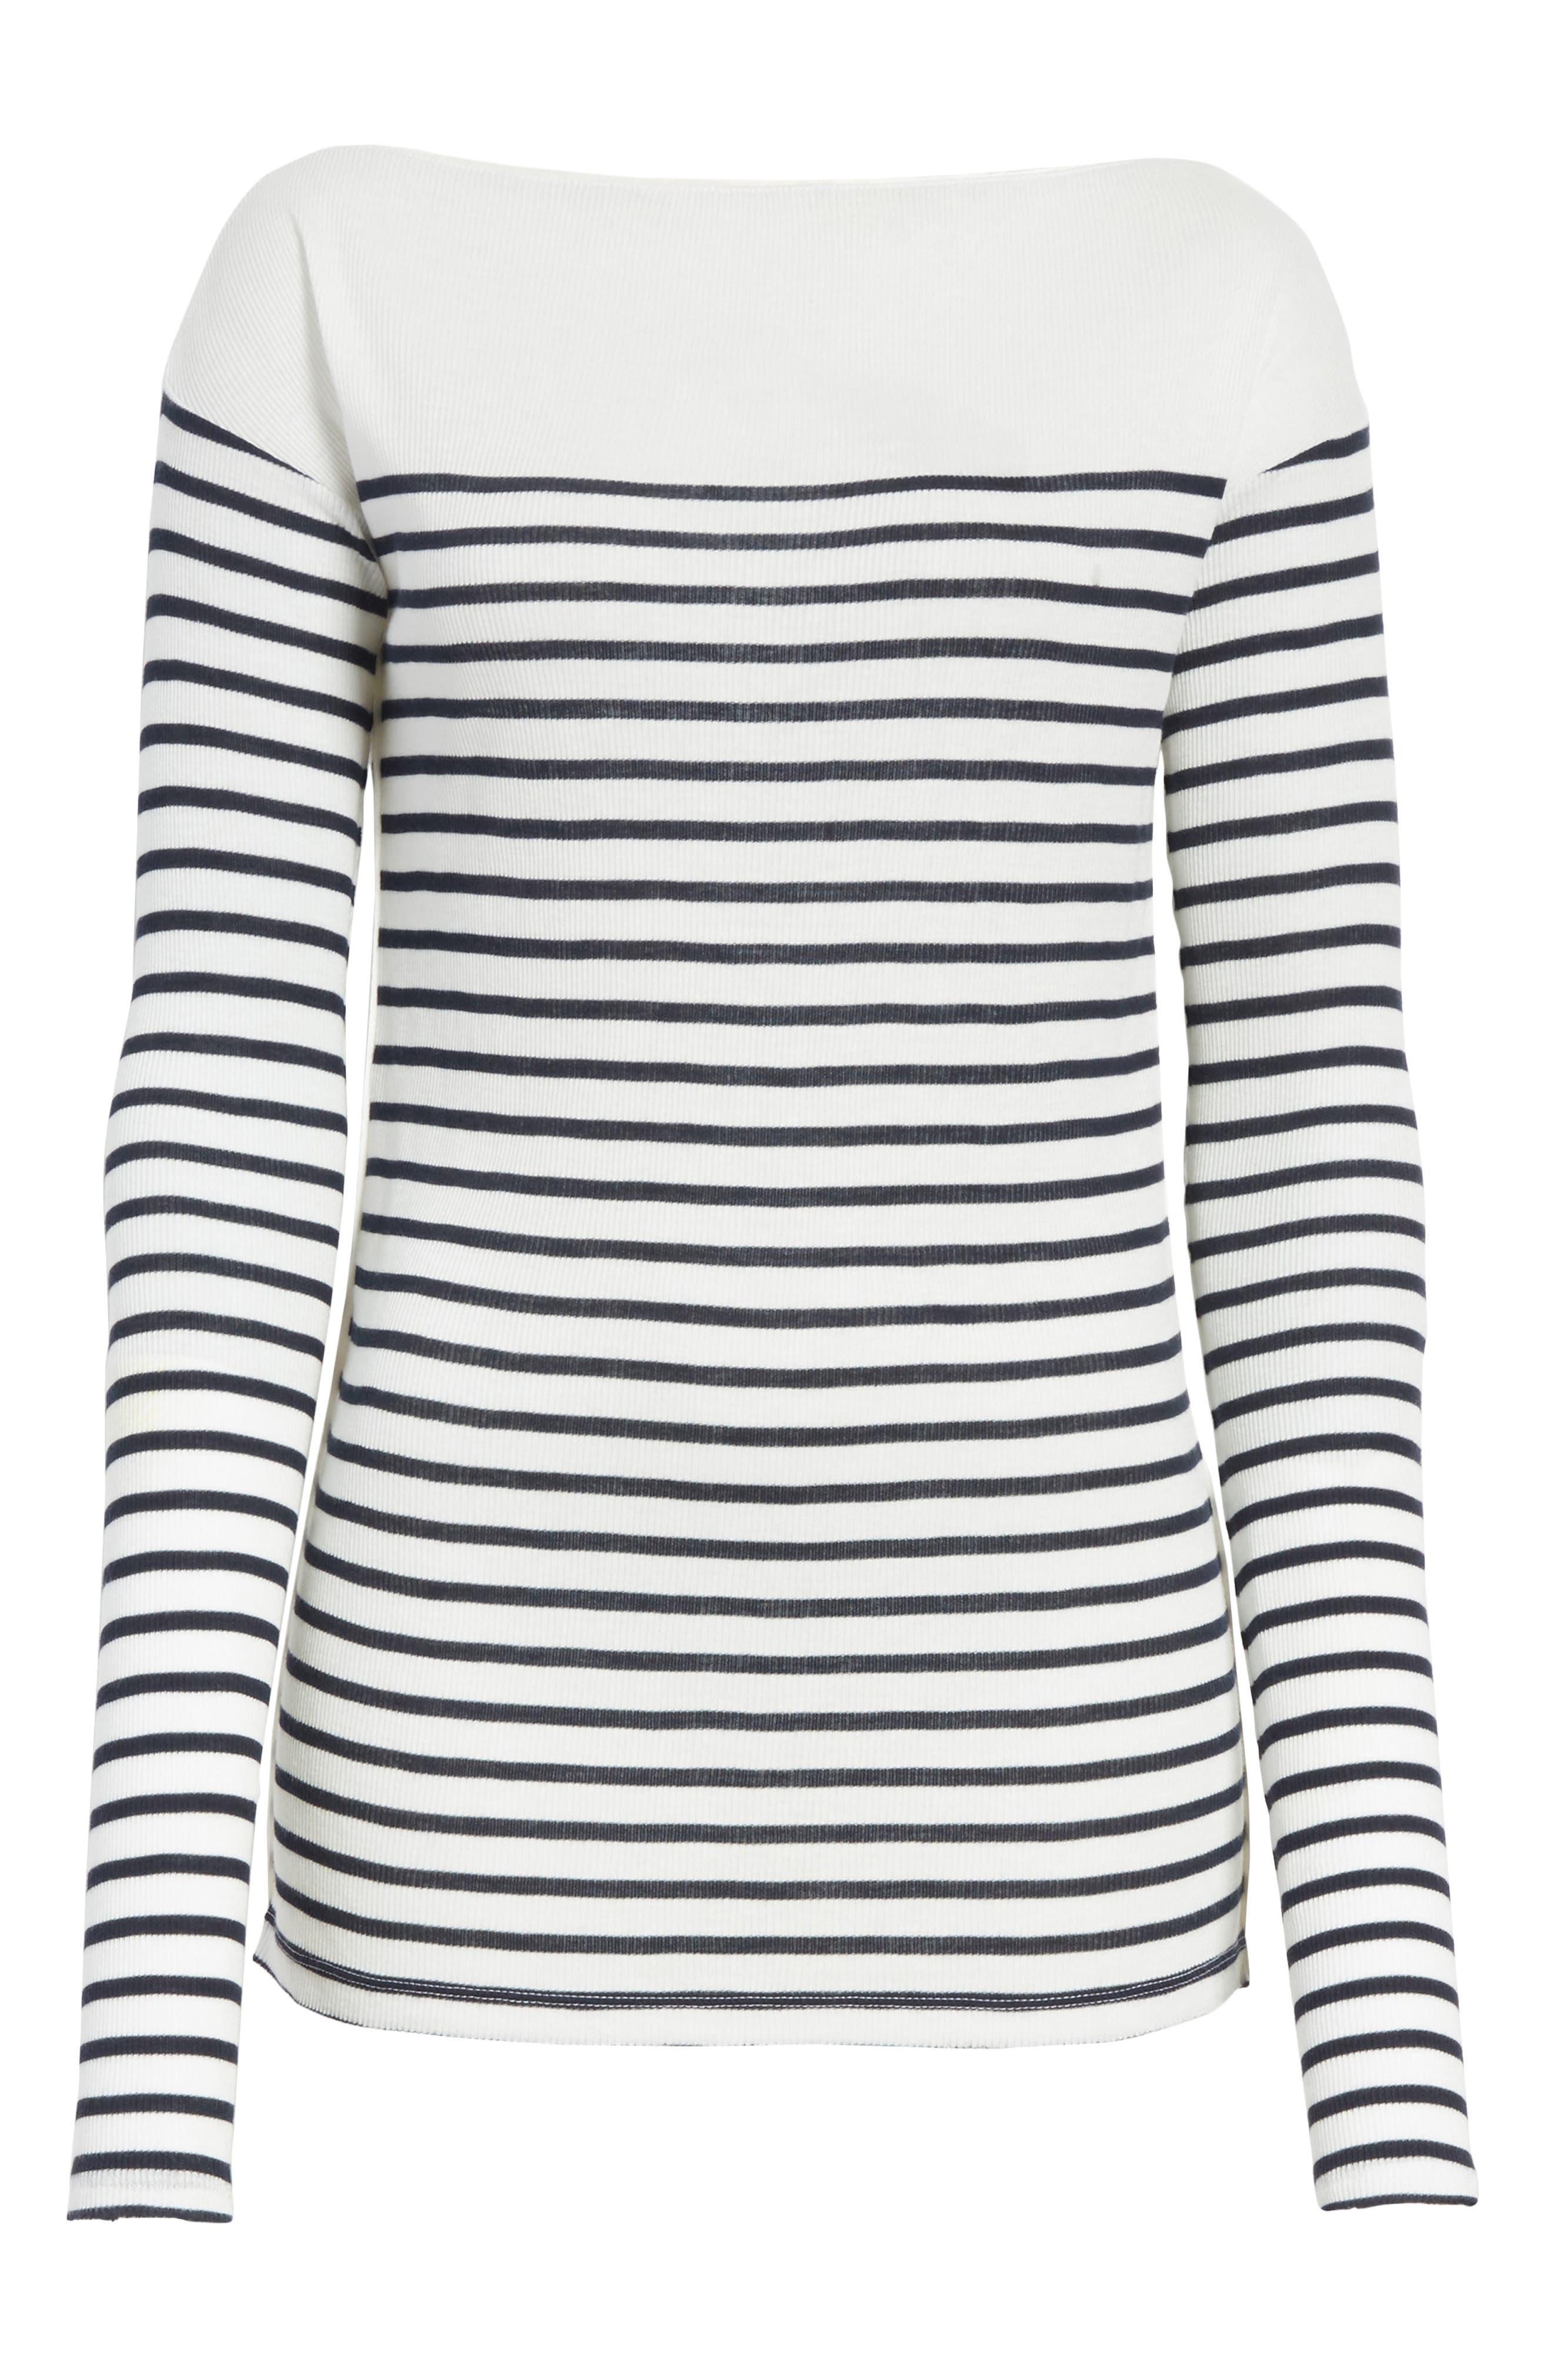 Madison Stripe Long Sleeve Top,                             Alternate thumbnail 6, color,                             Ivory/ Navy